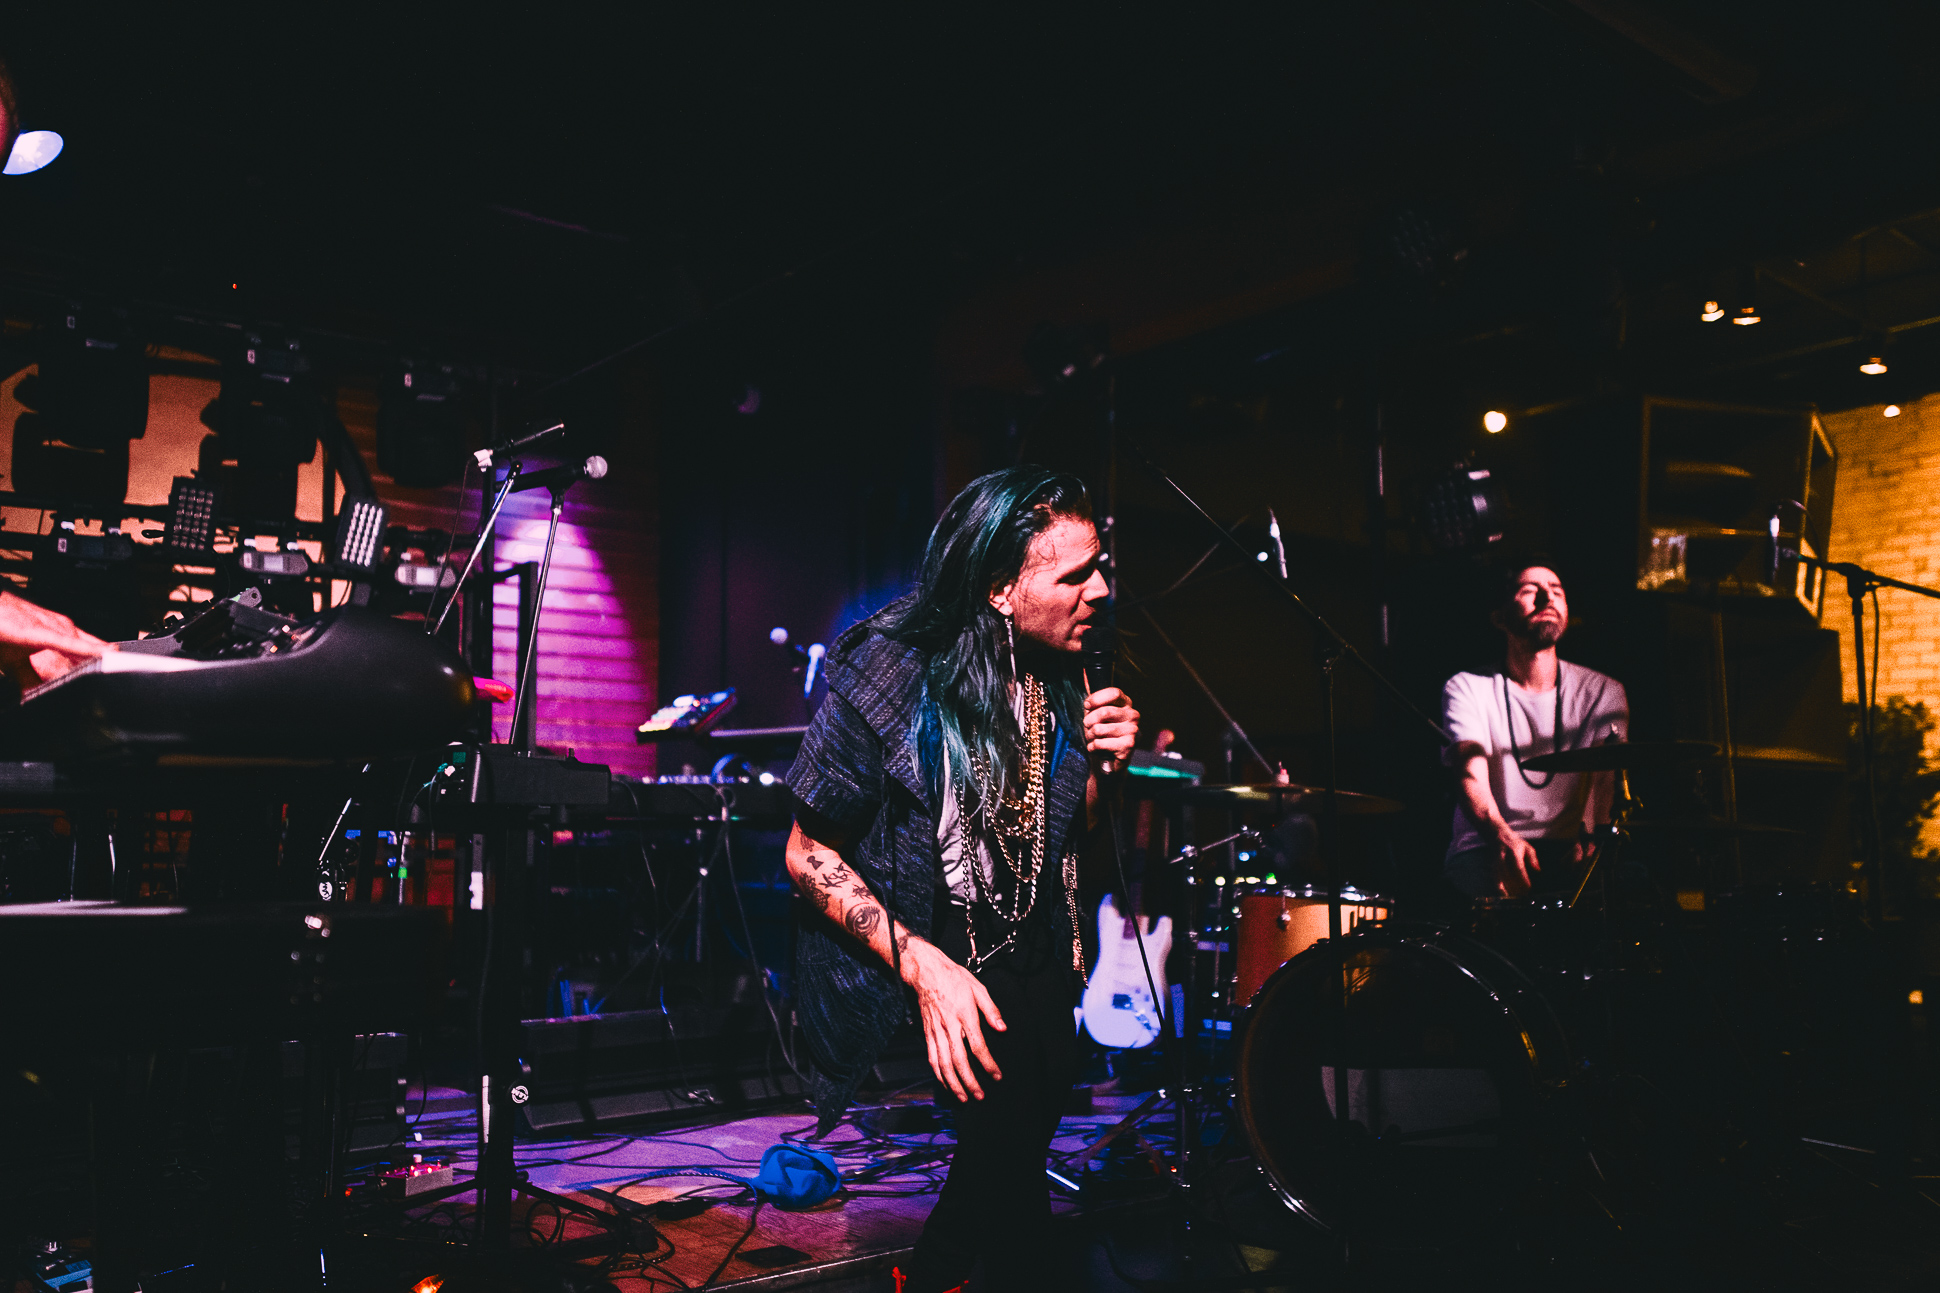 YoungAndSick-FortuneSoundClub-24-01-2019-Vancouver-15.jpg